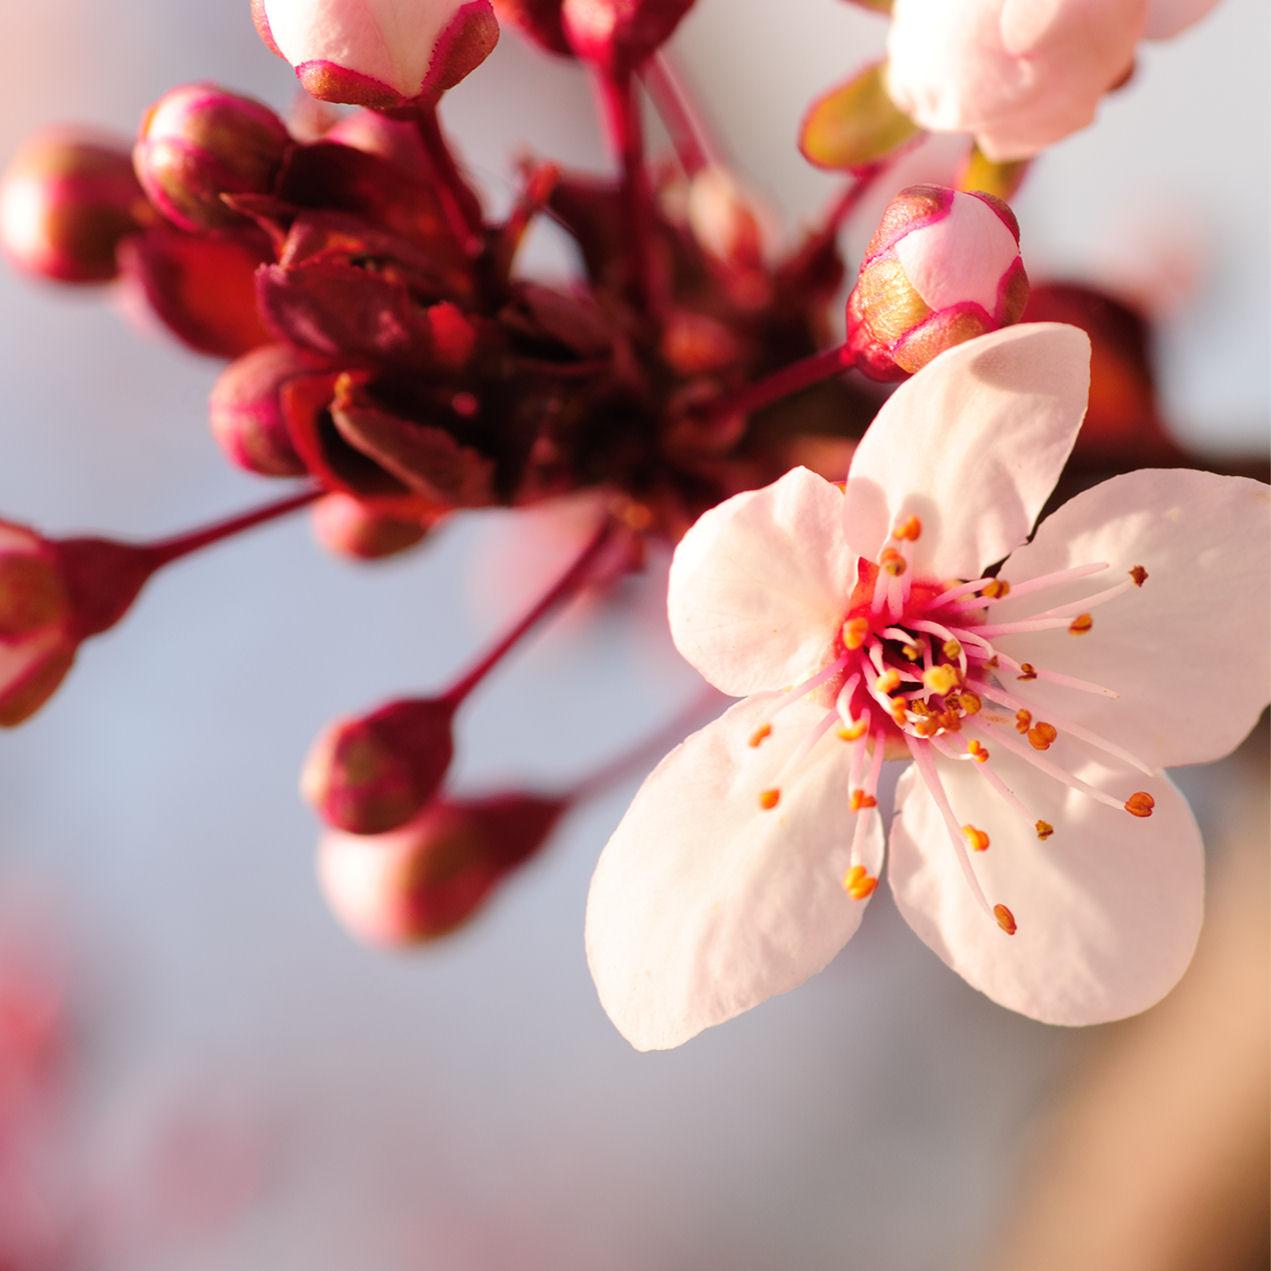 9 fotograf as gratis de flores color rosa fucsia y lila - Fotos de rosas de colores ...